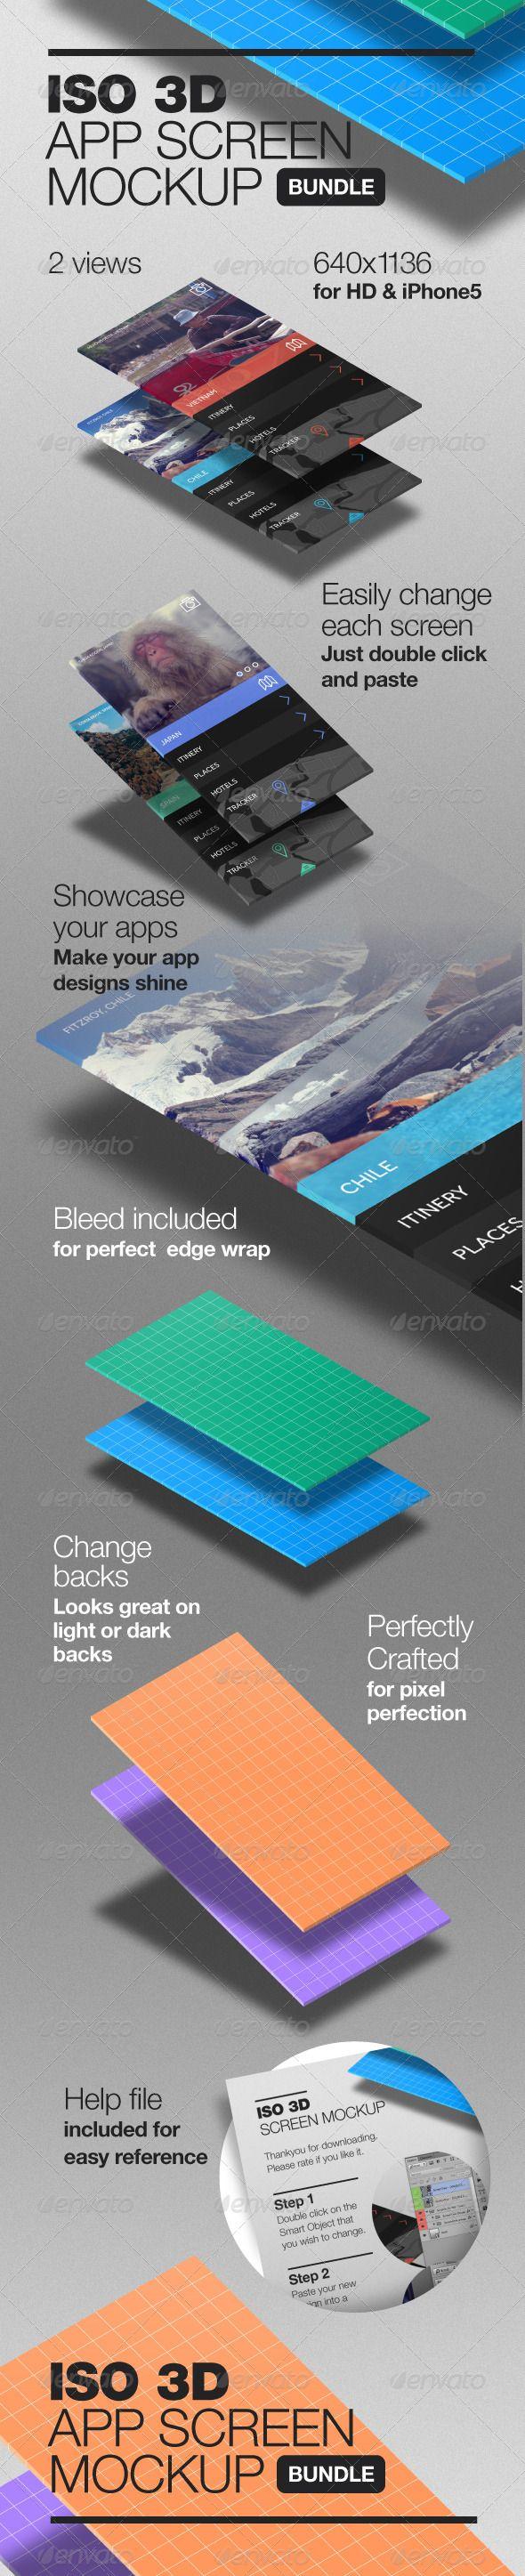 3D Isometric App Screen Mockup - Mobile Displays http://graphicriver.net/item/3d-isometric-app-screen-mockup/6442578 graphic river